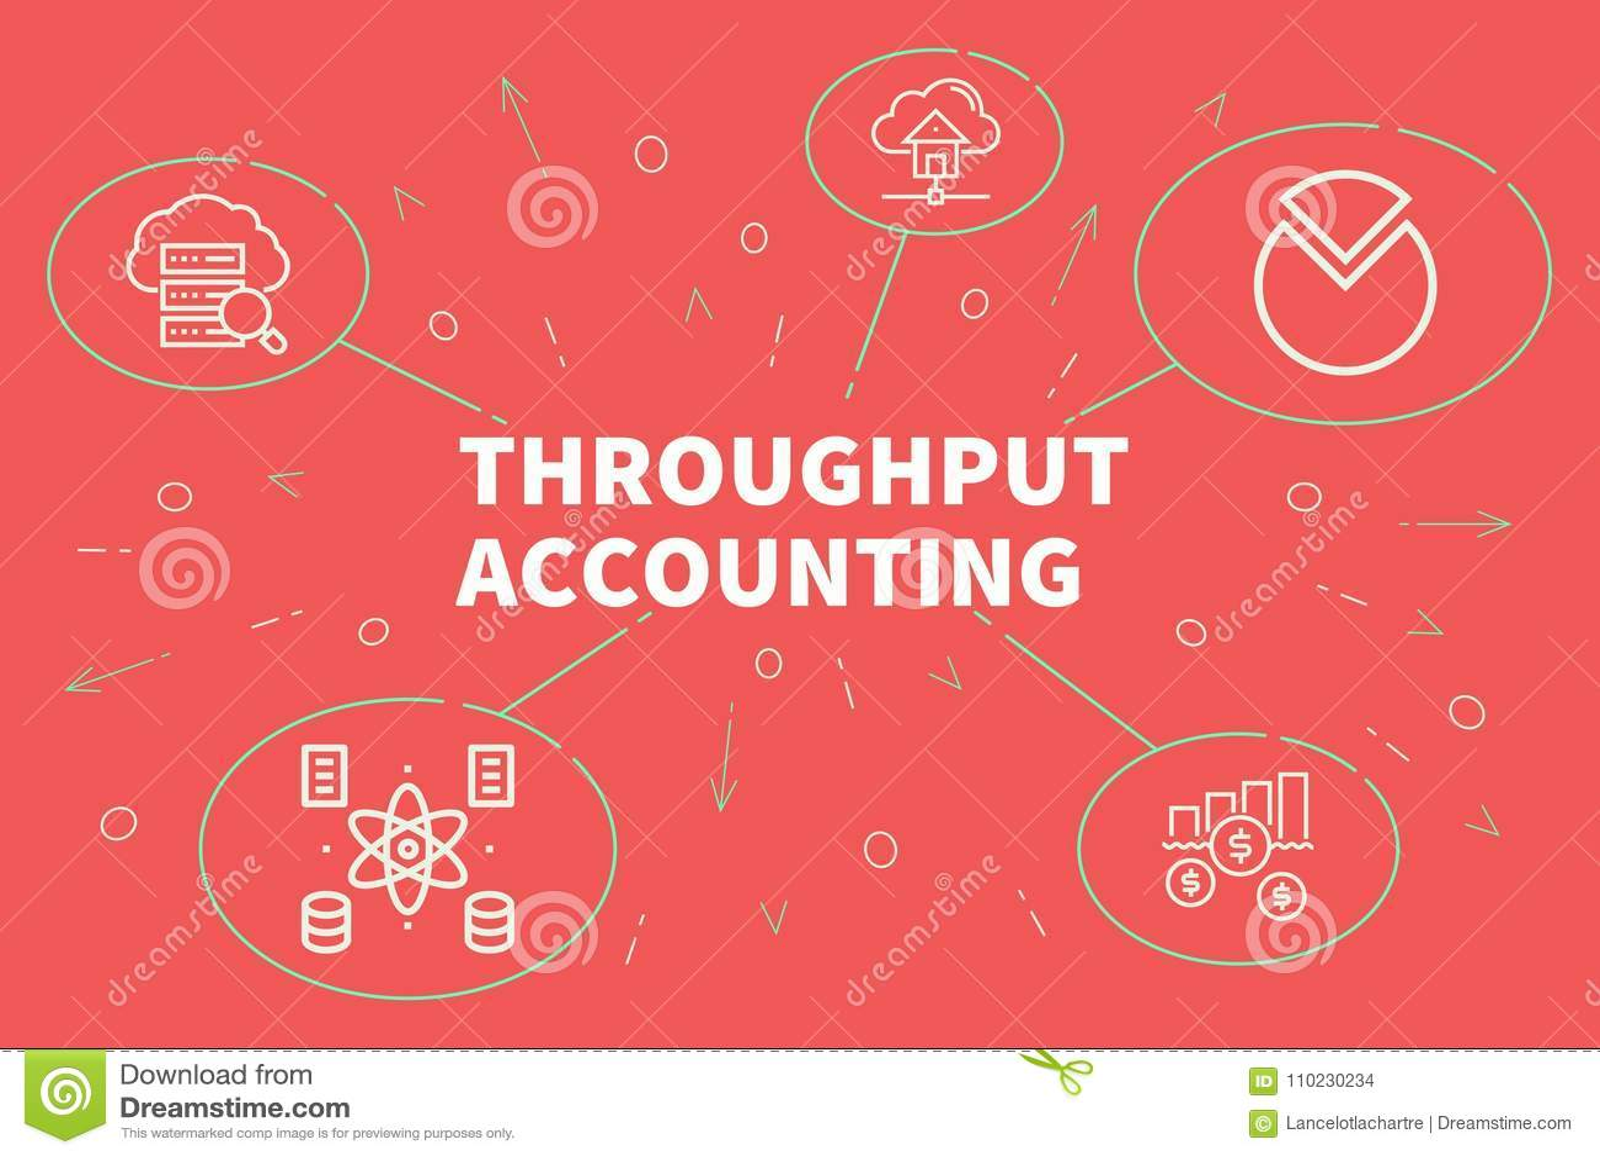 CIMA P2: Throughput Accounting